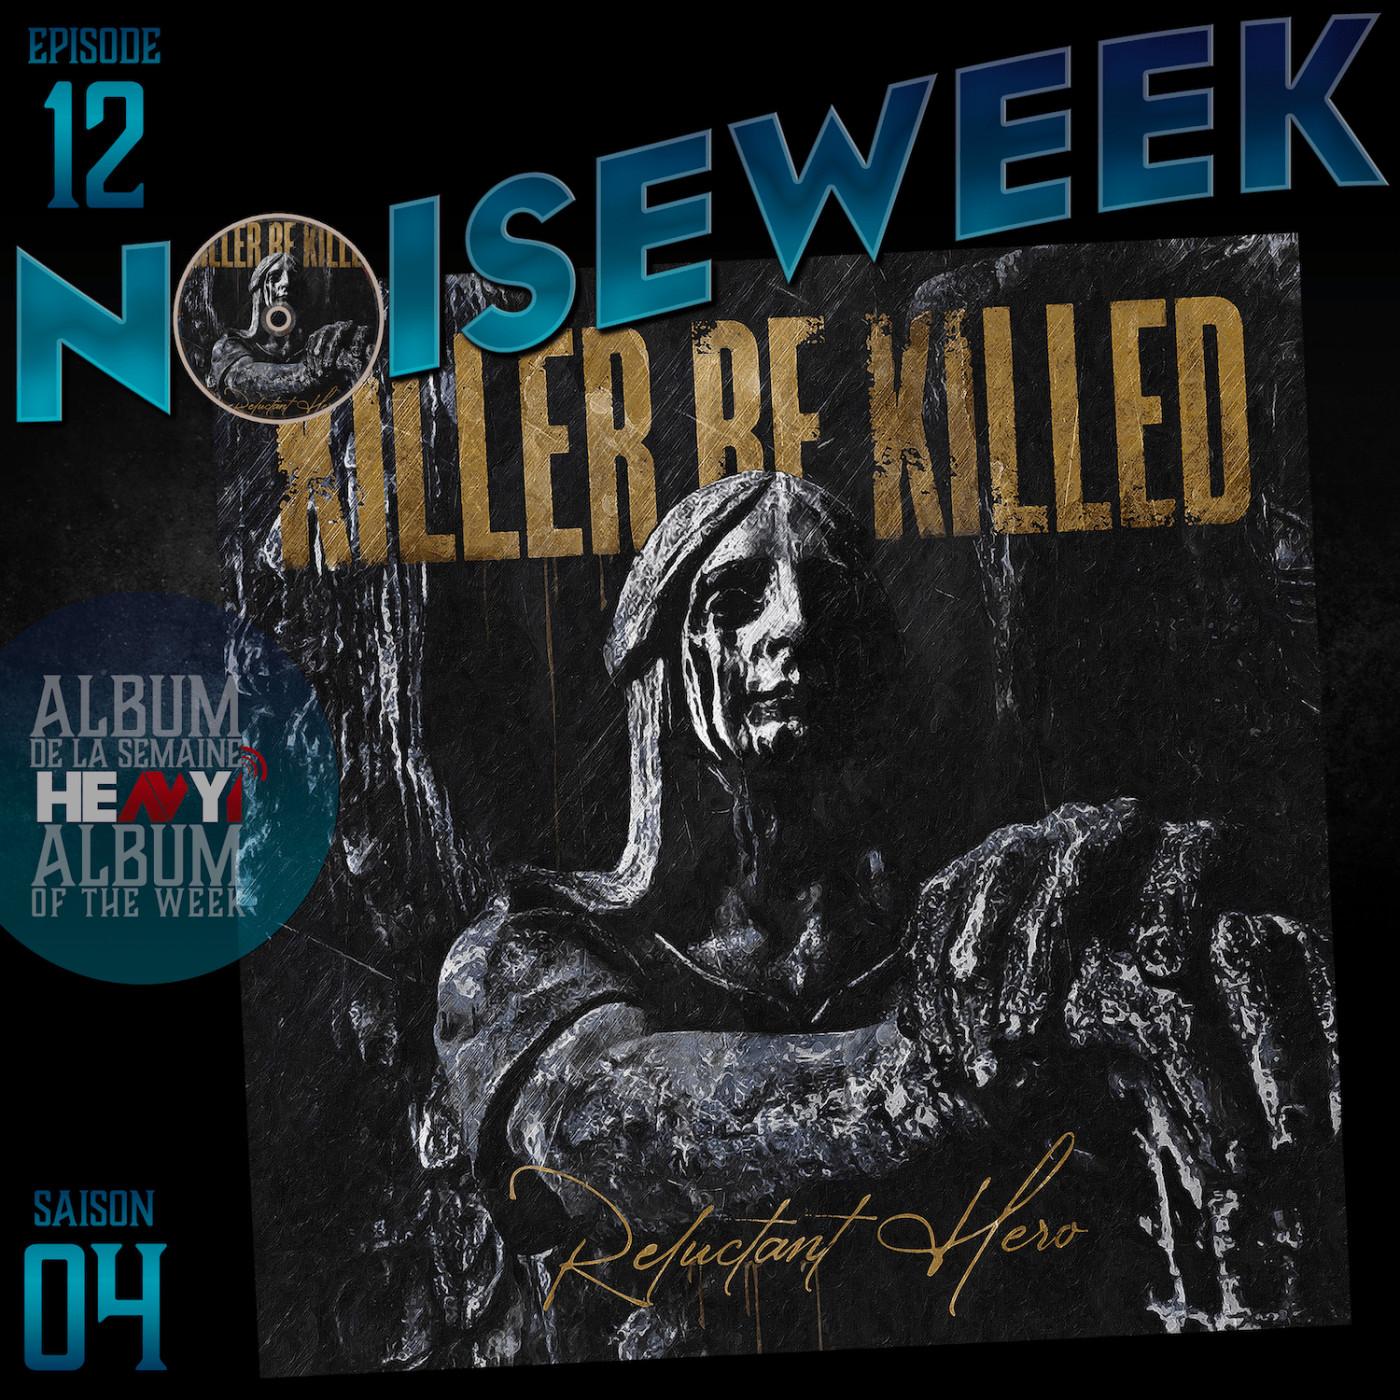 Noiseweek #12 Saison 4